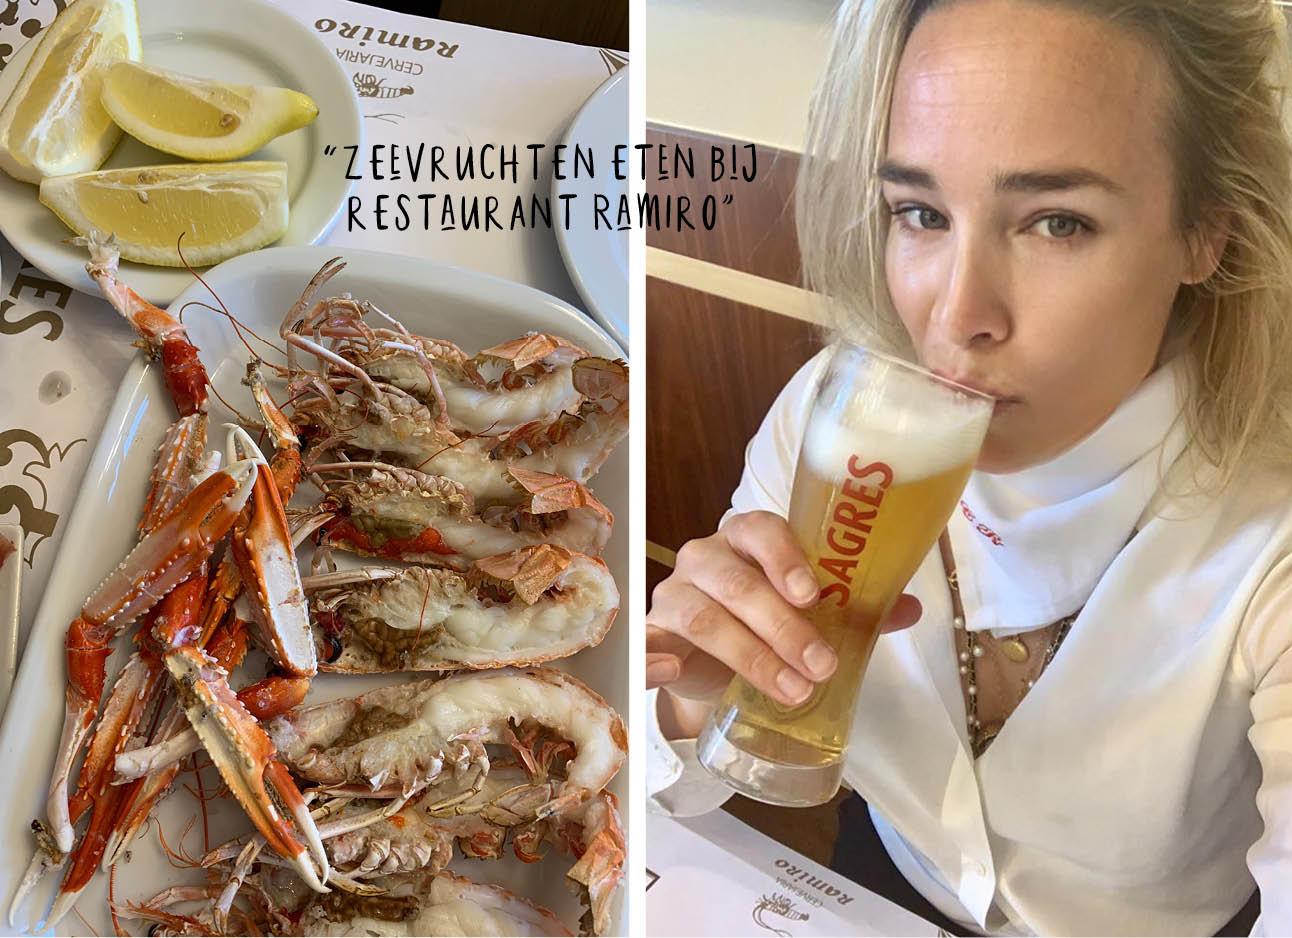 zeevruchten eten en bier drinken